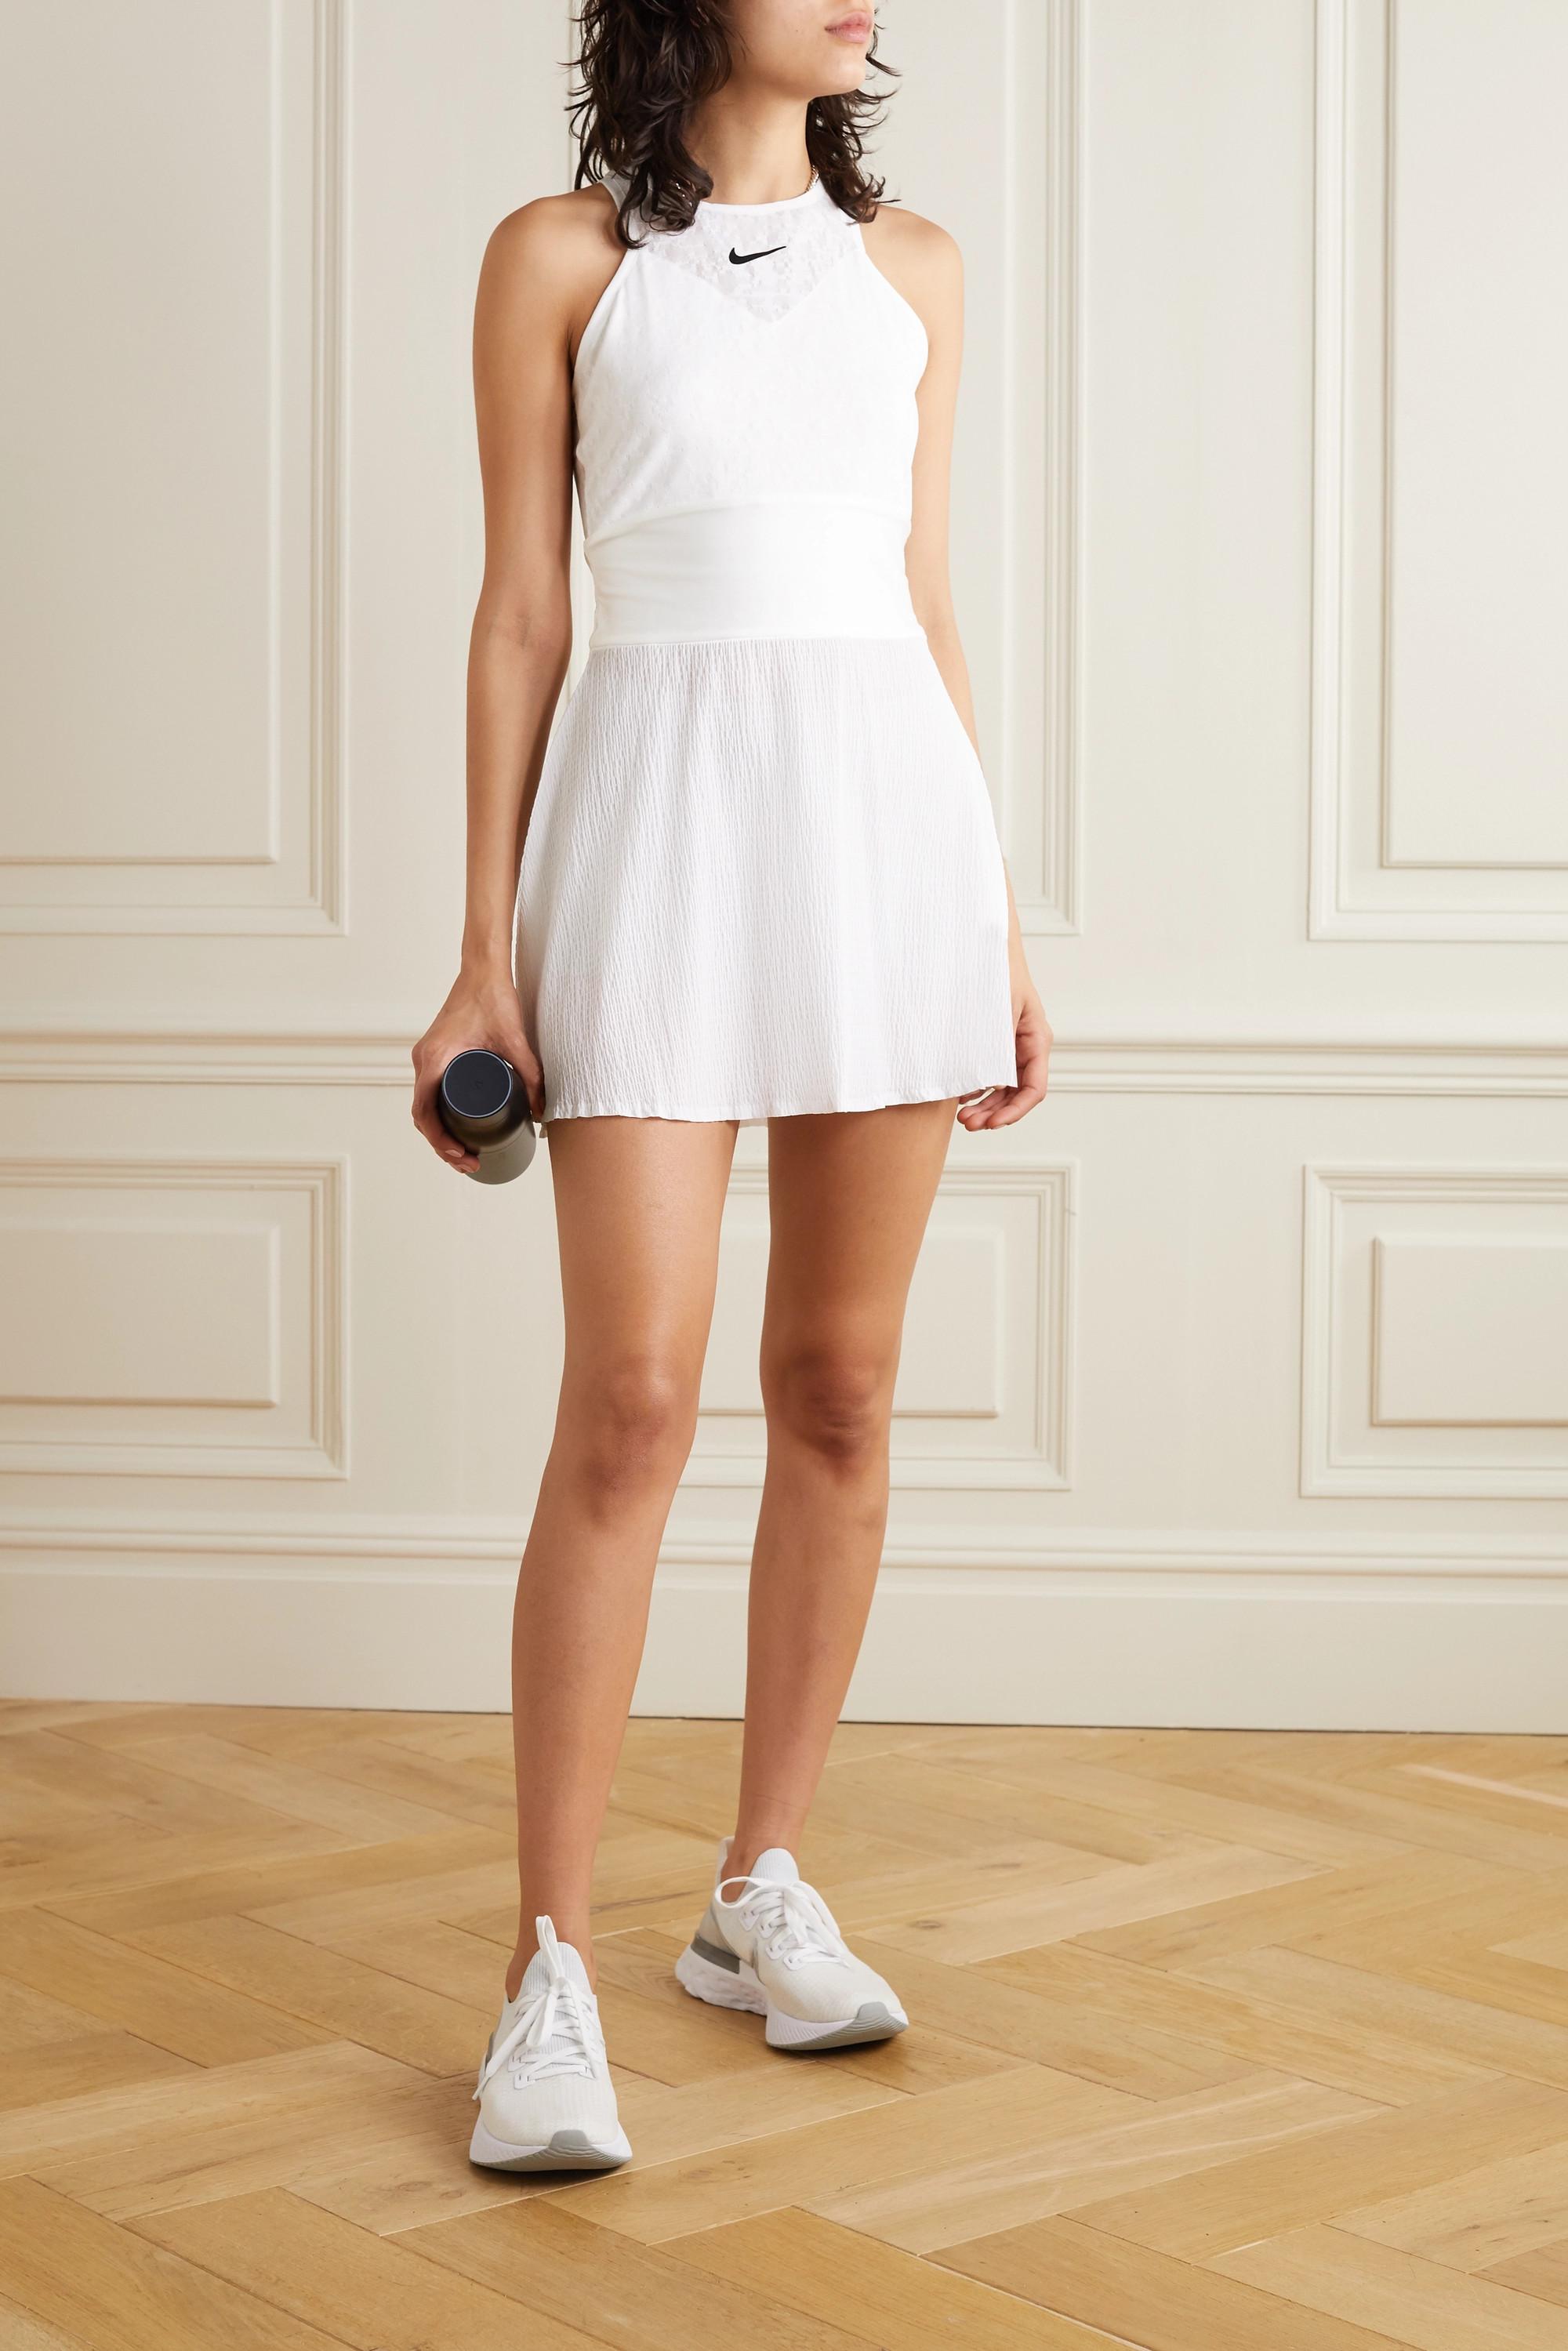 White Maria Cutout Satin Trimmed Stretch Lace And Seersucker Mini Tennis Dress Nike Net A Porter